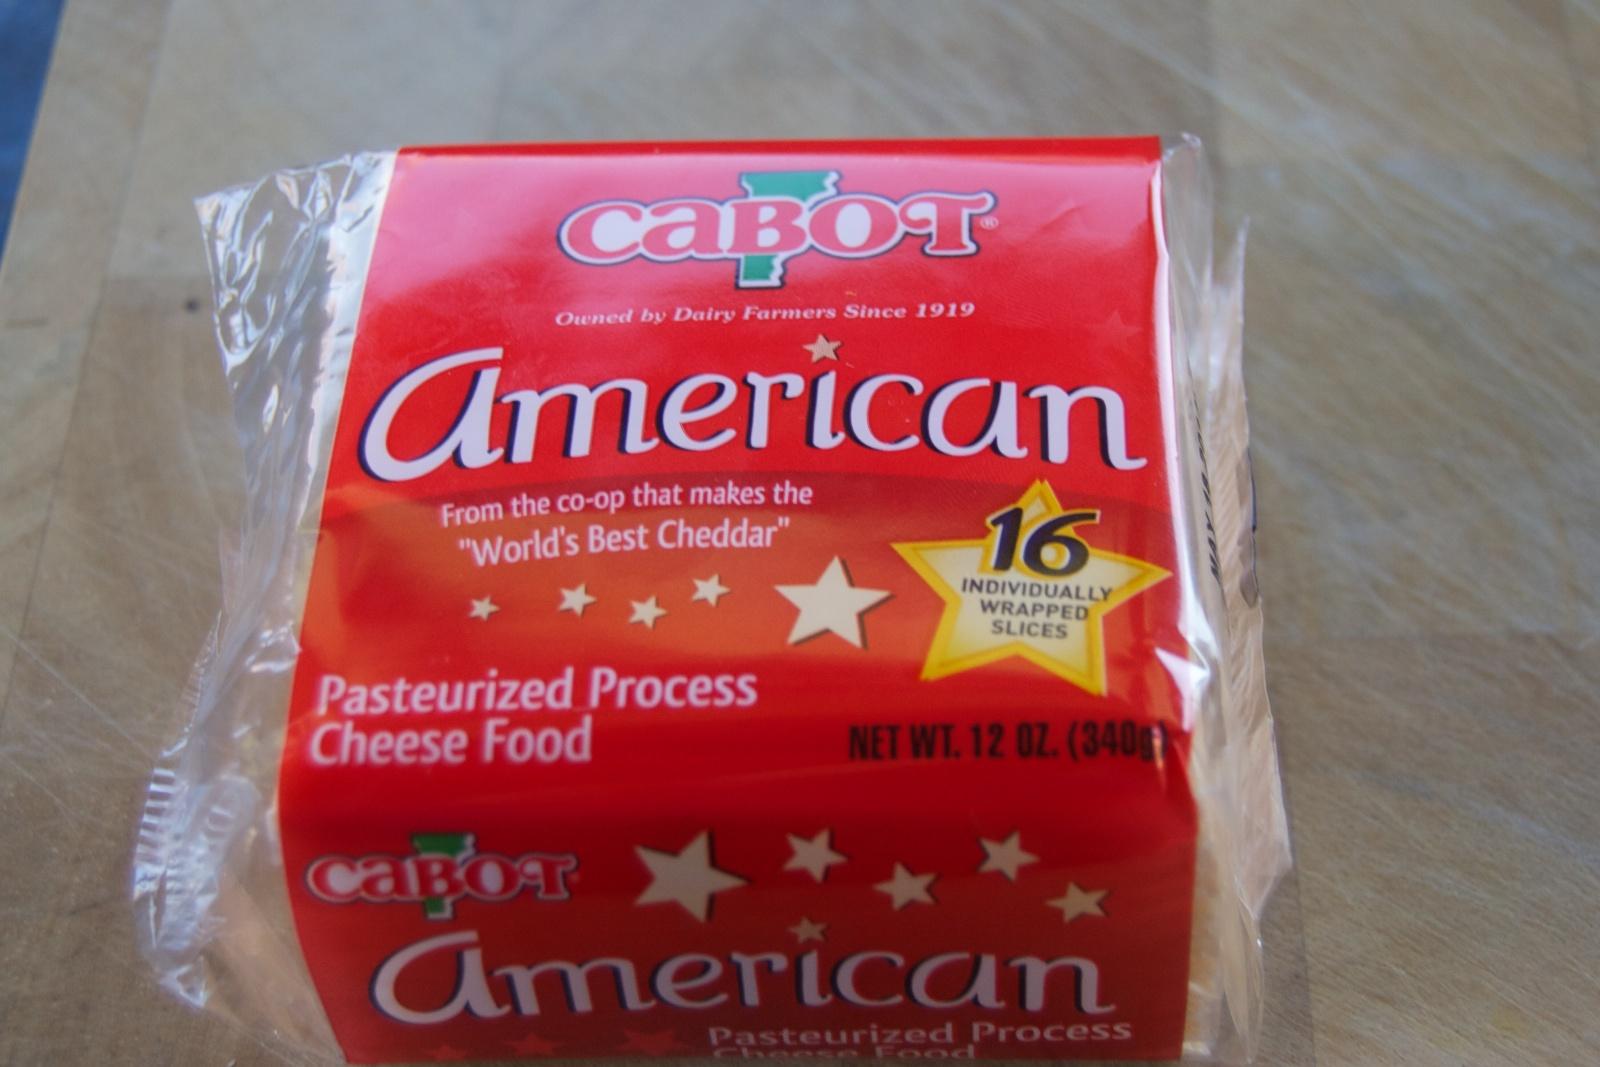 http://blog.rickk.com/food/2013/11/16/ate.2013.11.16.c1.jpg